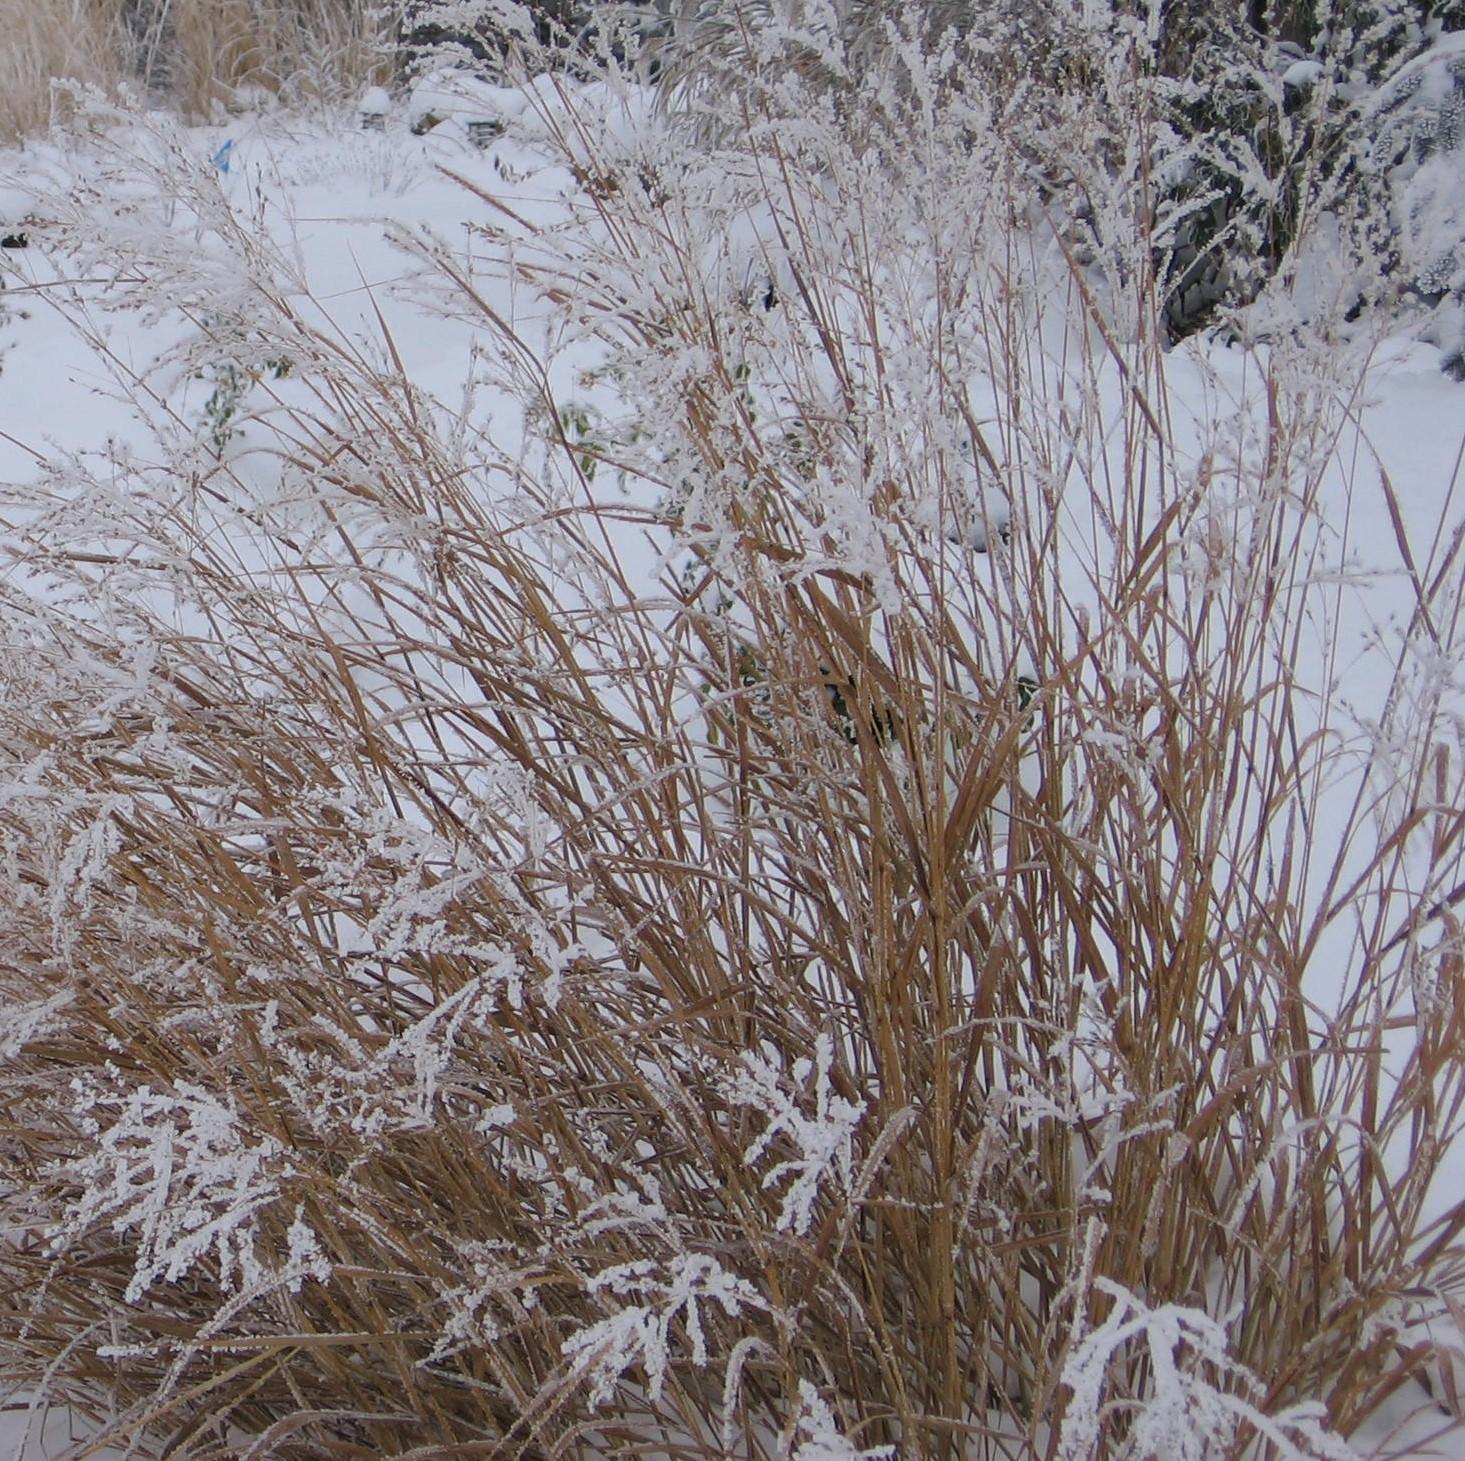 Switch grass - Panicum virgatum - in rare central Texas snow